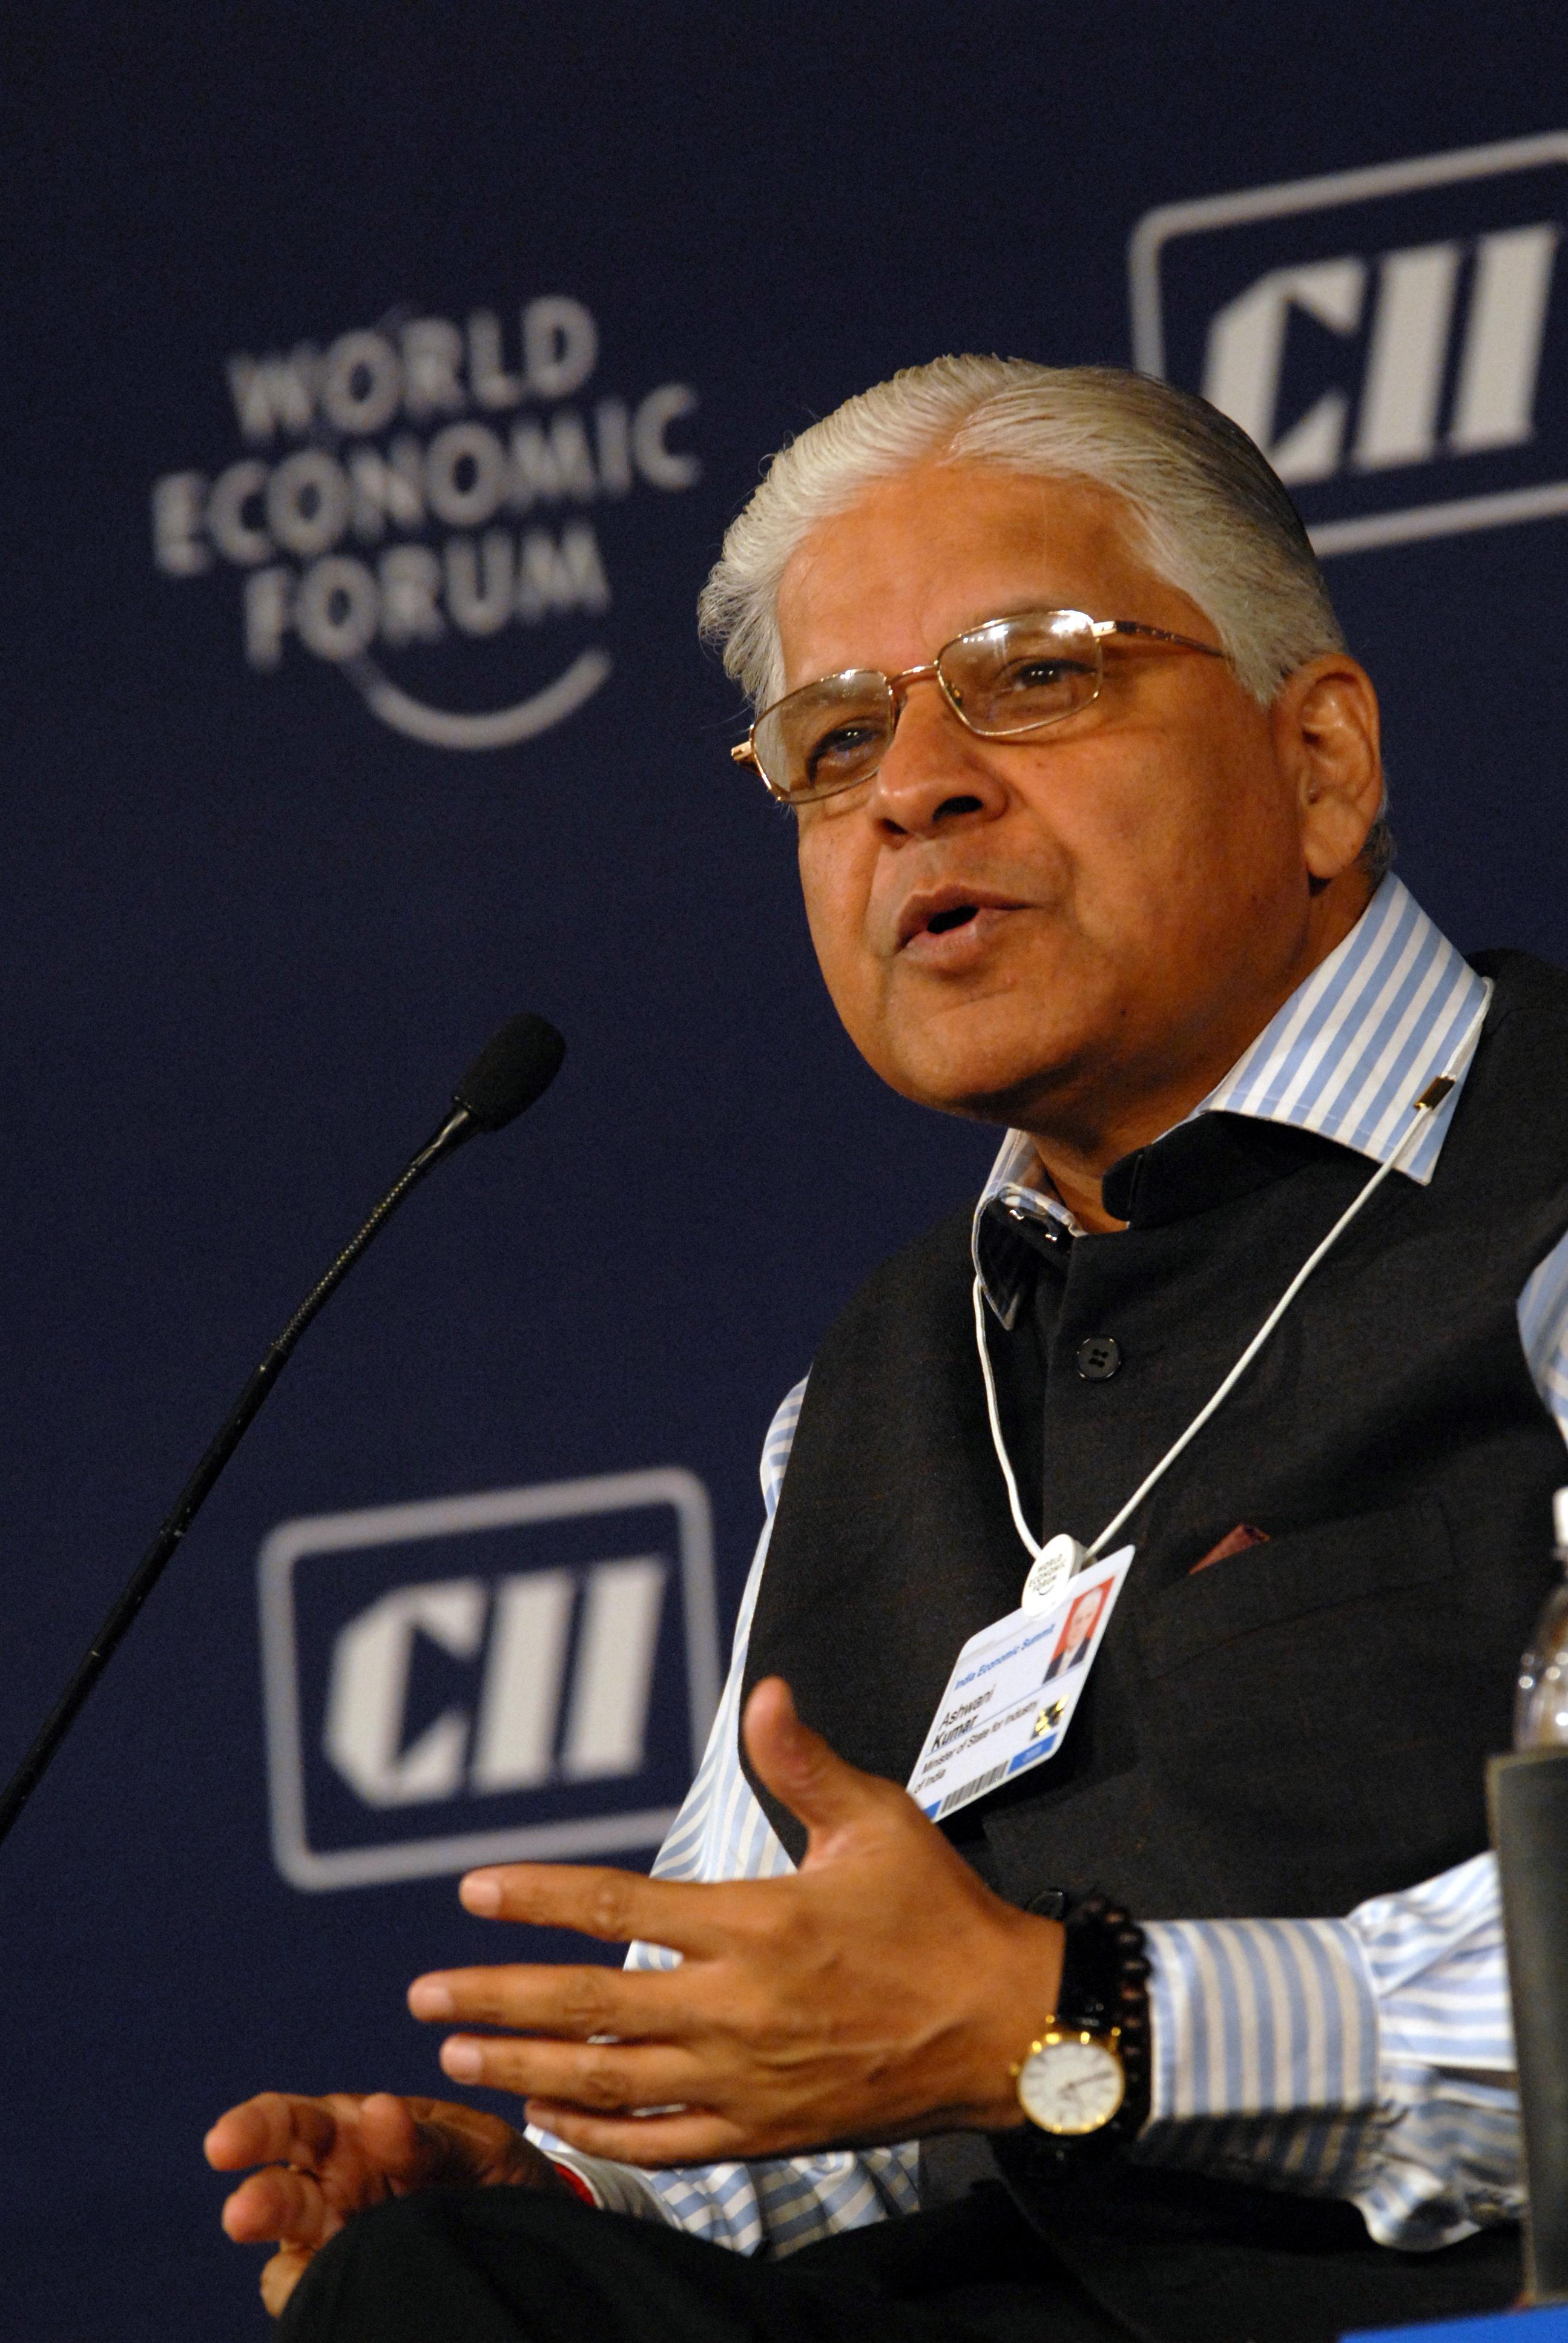 Ashwani_Kumar_at_the_India_Economic_Summit_2008